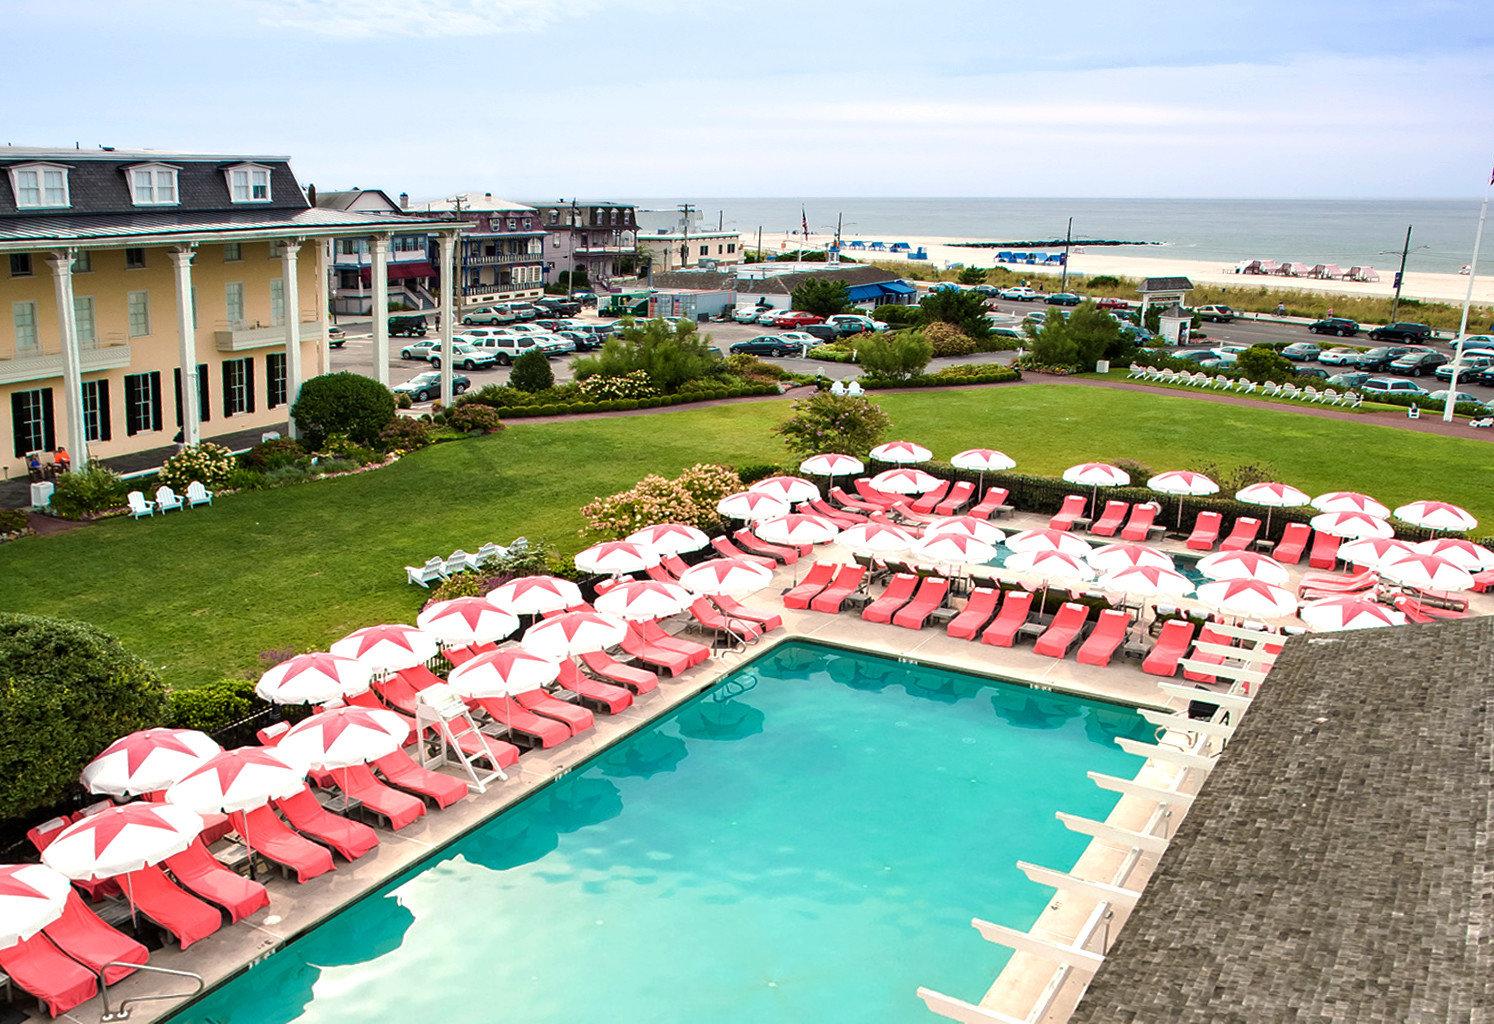 Historic Hotels New York Romance Trip Ideas Weekend Getaways grass sky leisure swimming pool lawn Resort marina dock